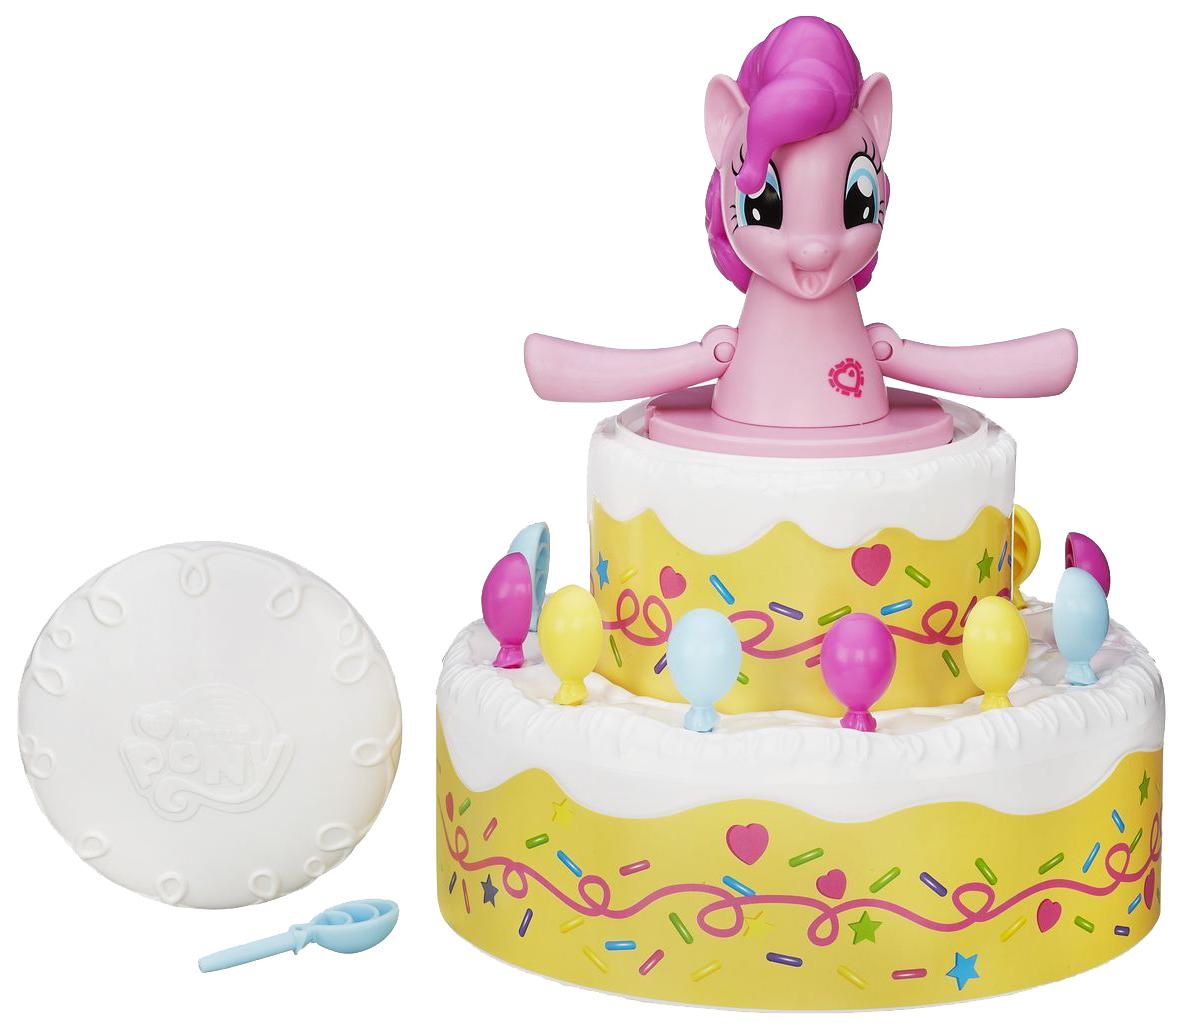 Фигурка My little Pony Hasbro Сюрприз Пинки Пай